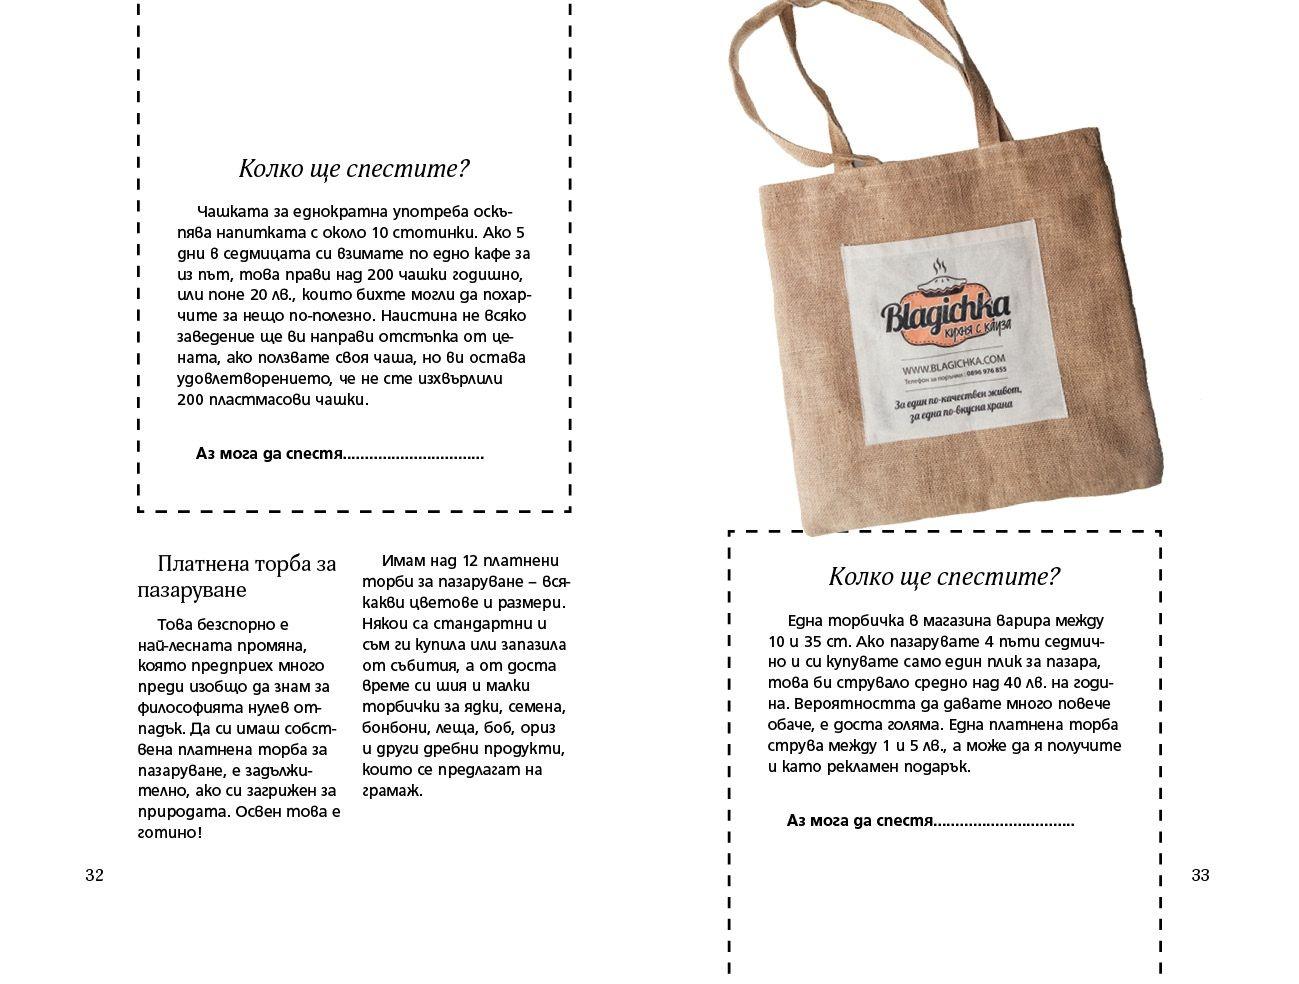 Живот с нулев отпадък в България - 3